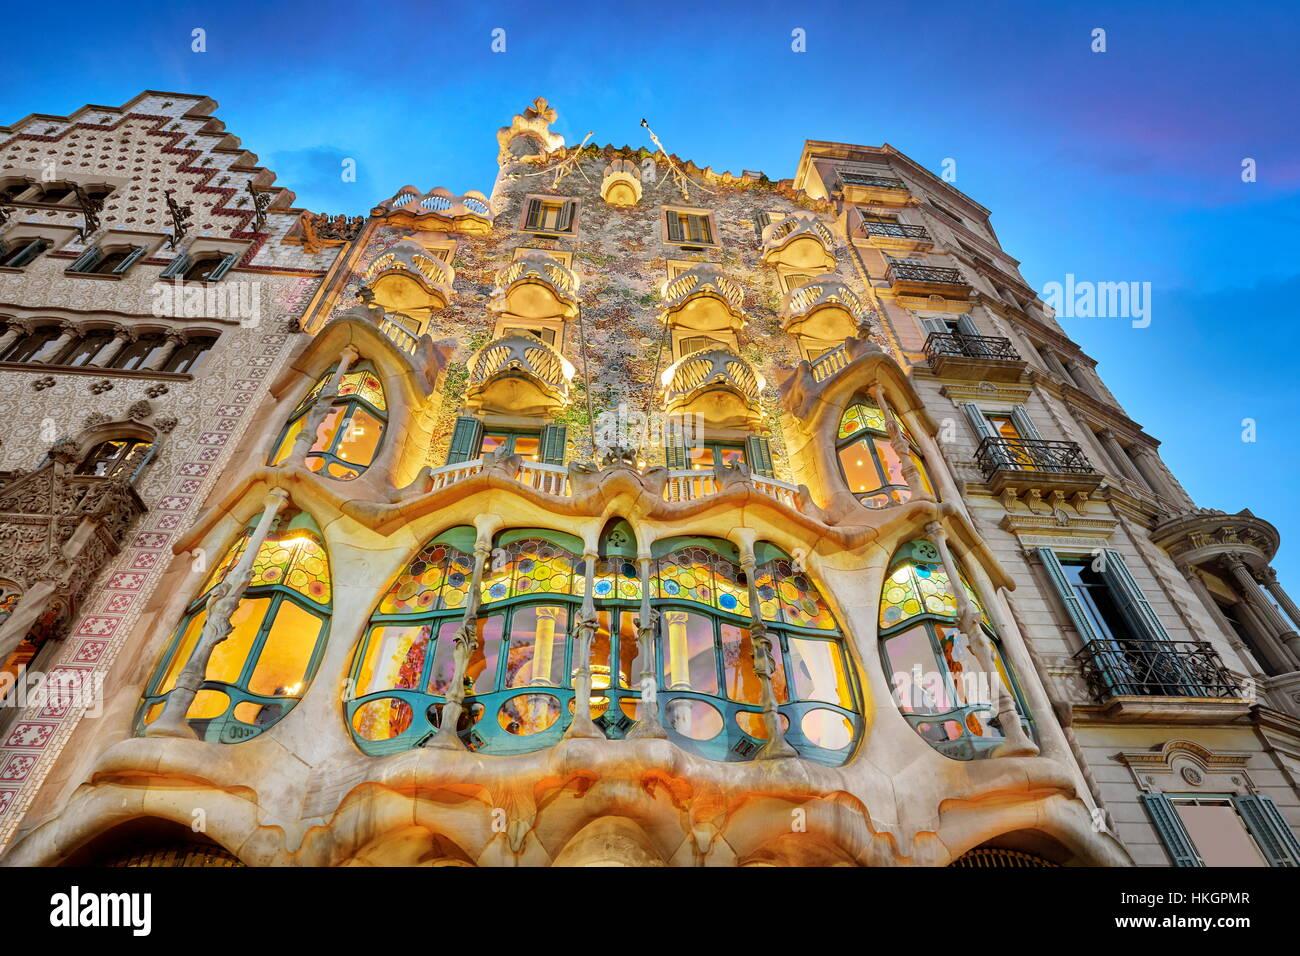 Casa Batllo Haus Design von Antonio Gaudi am Abend, Barcelona, Spanien Stockbild